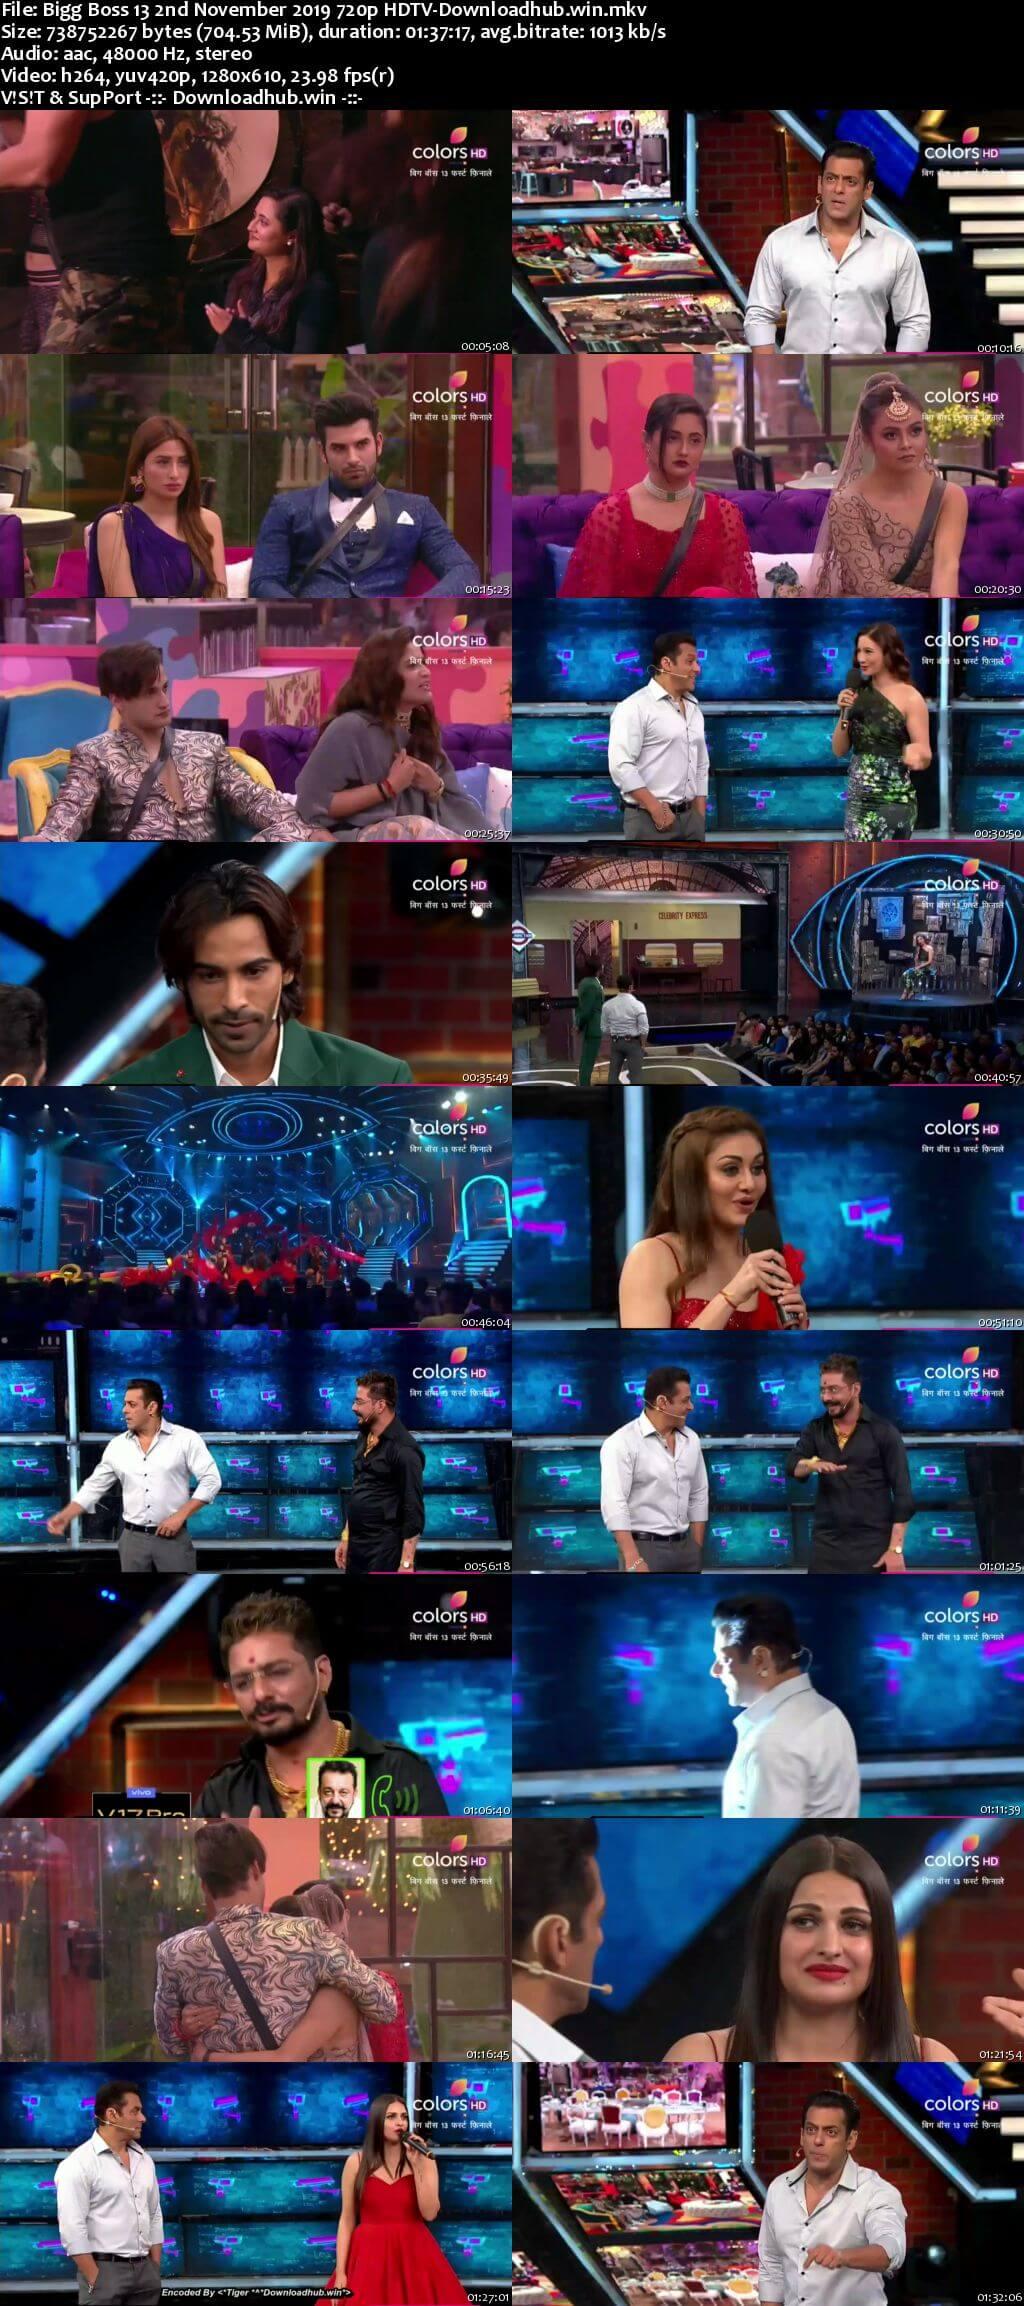 Bigg Boss 13 02 November 2019 Episode 33 HDTV 720p 480p